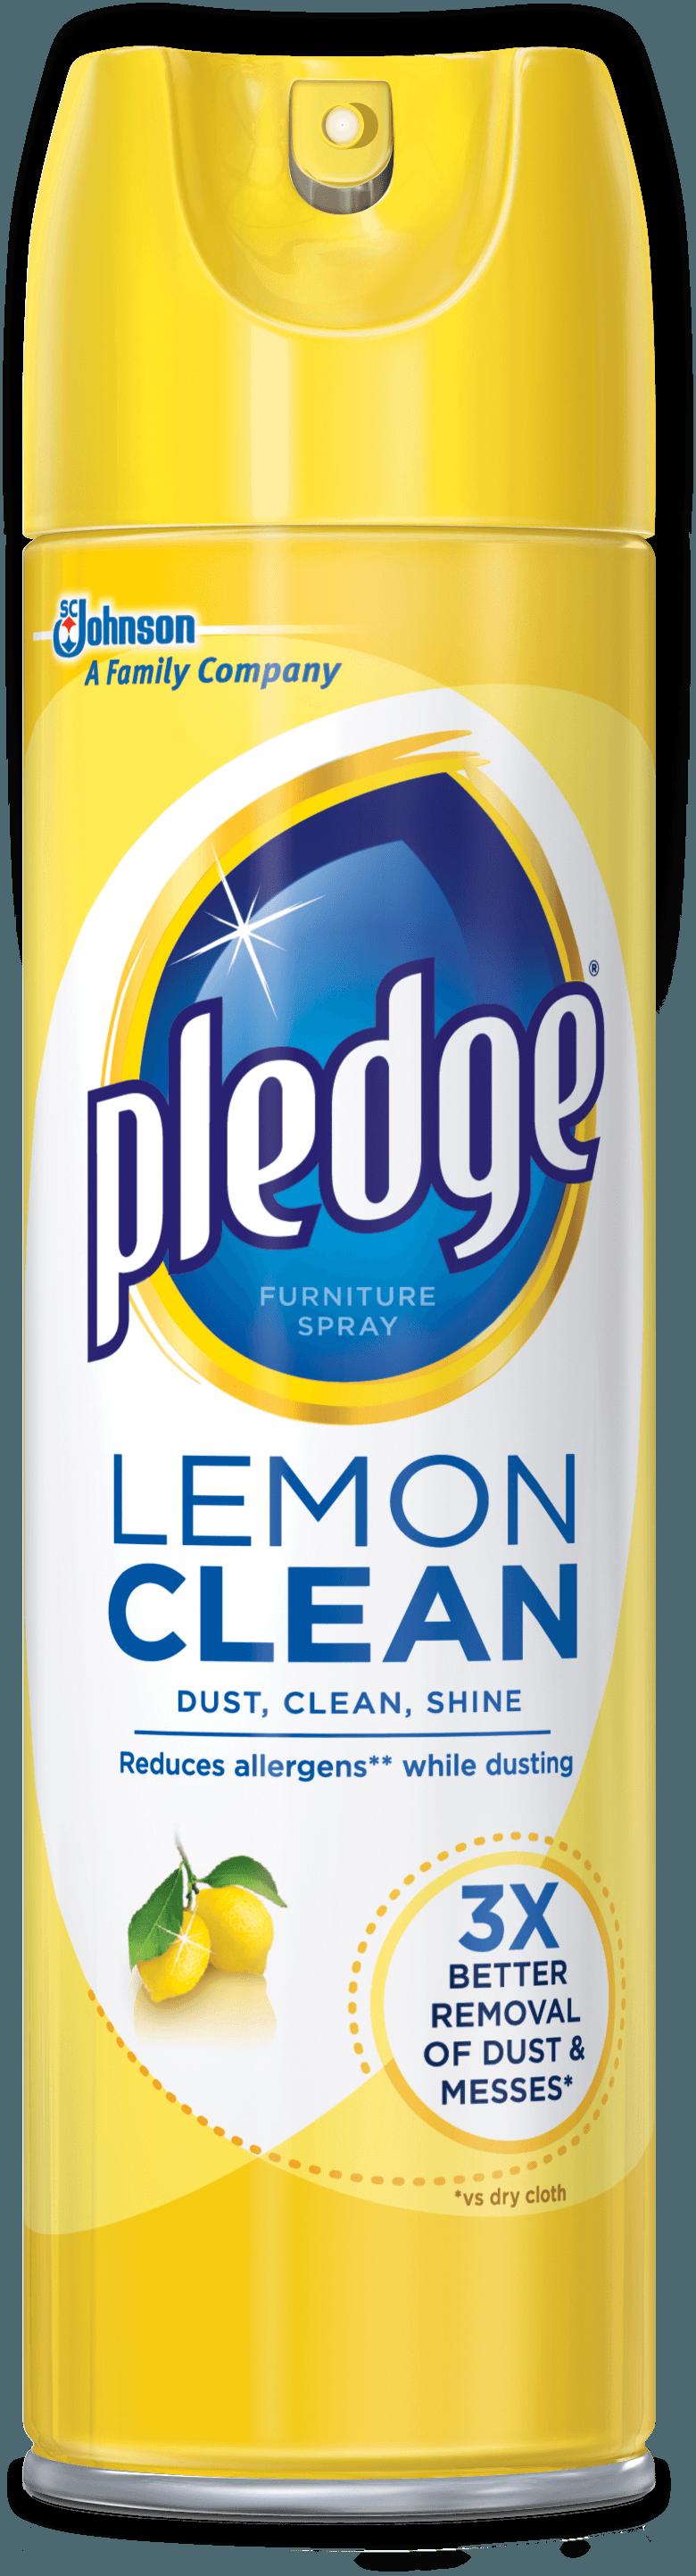 Lemon Clean Furniture Spray - Pledge PNG